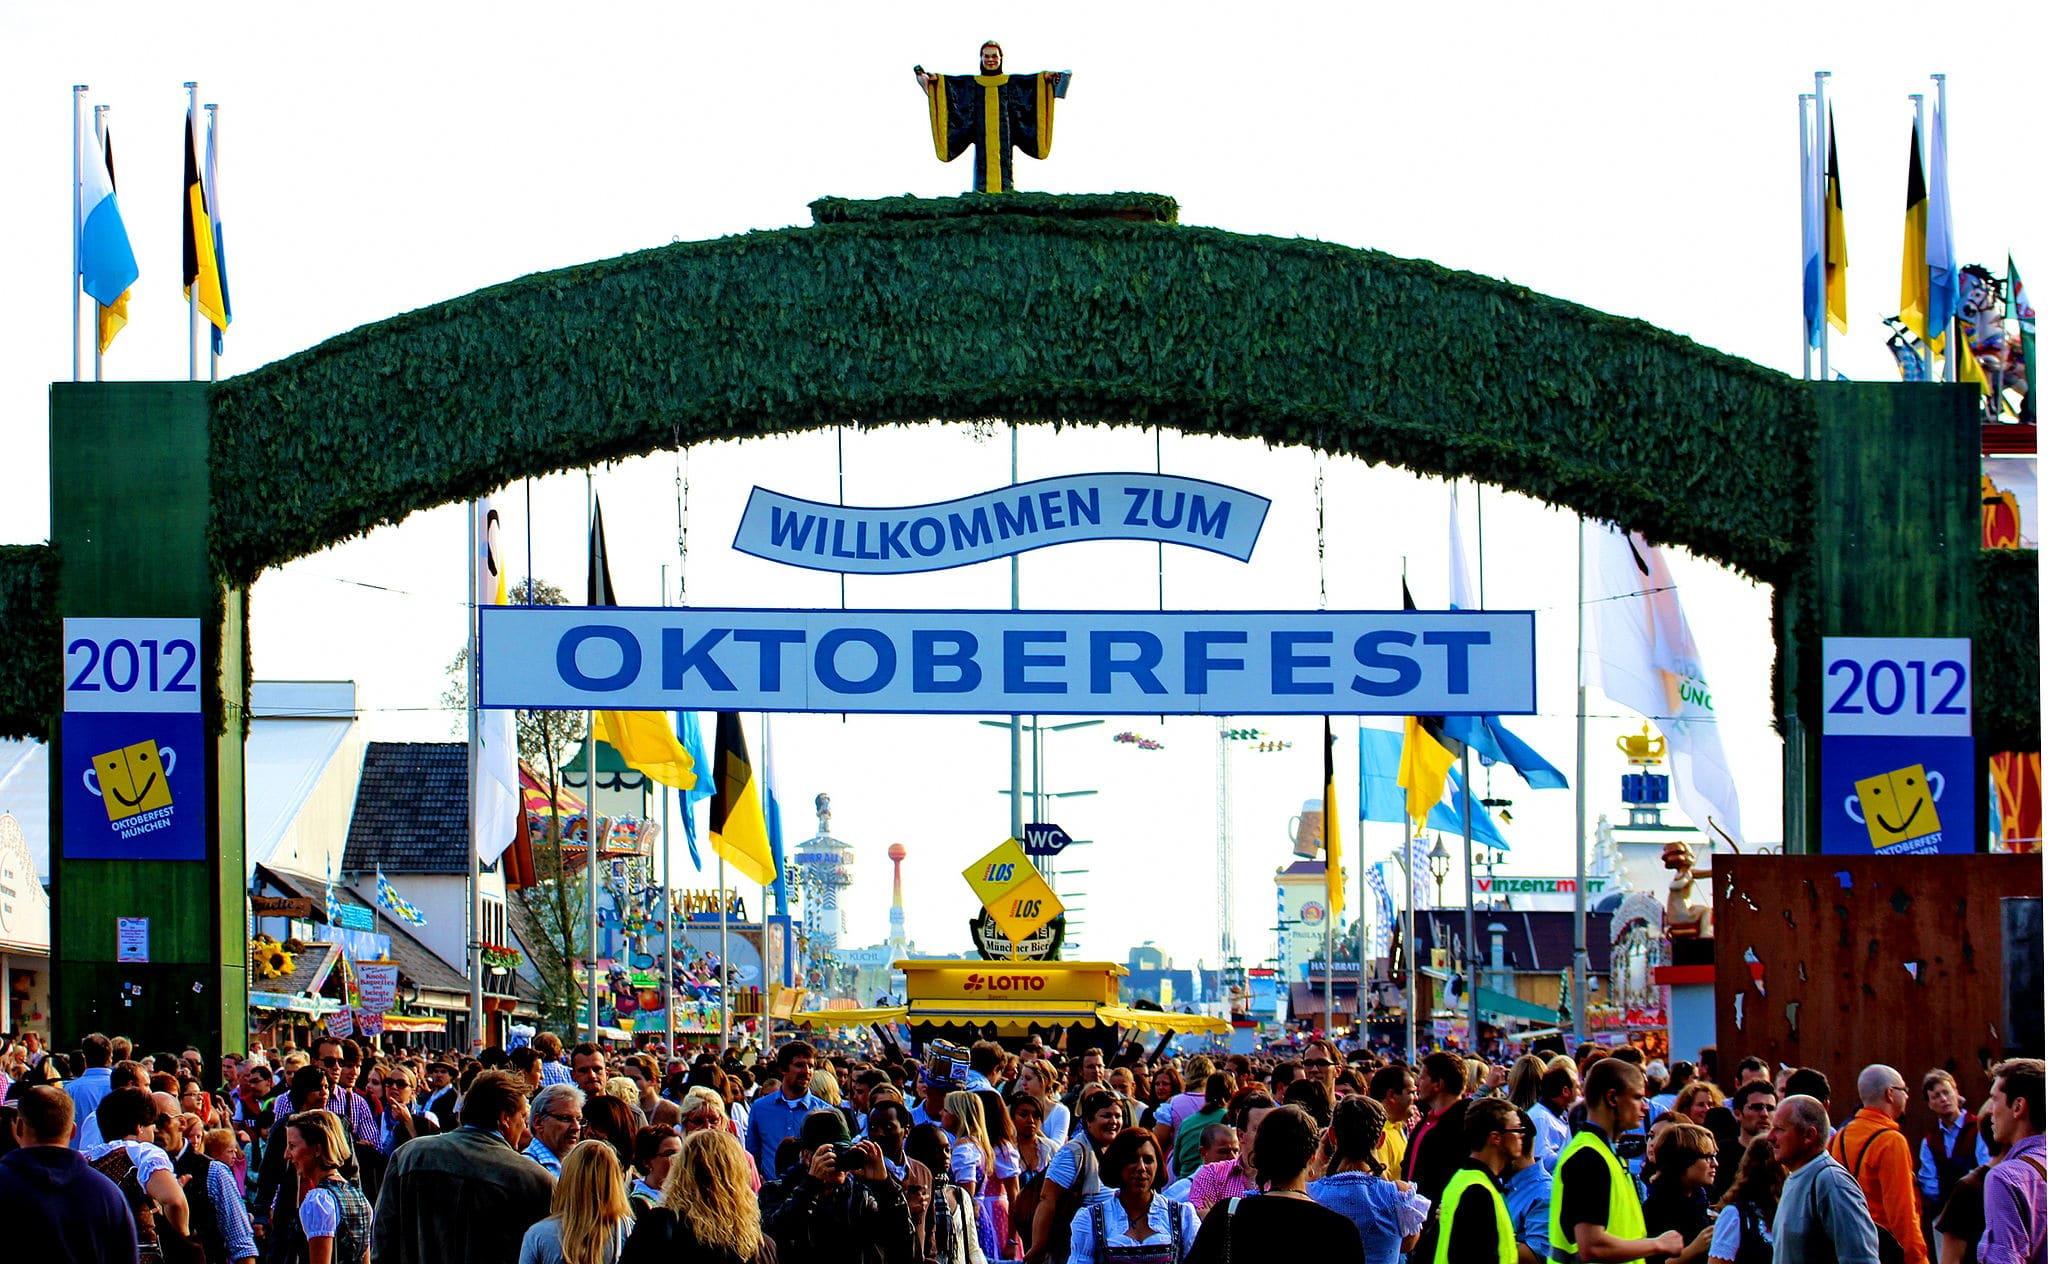 Oktoberfest - 8 Festivals From Around The World To Add To Your Bucket List